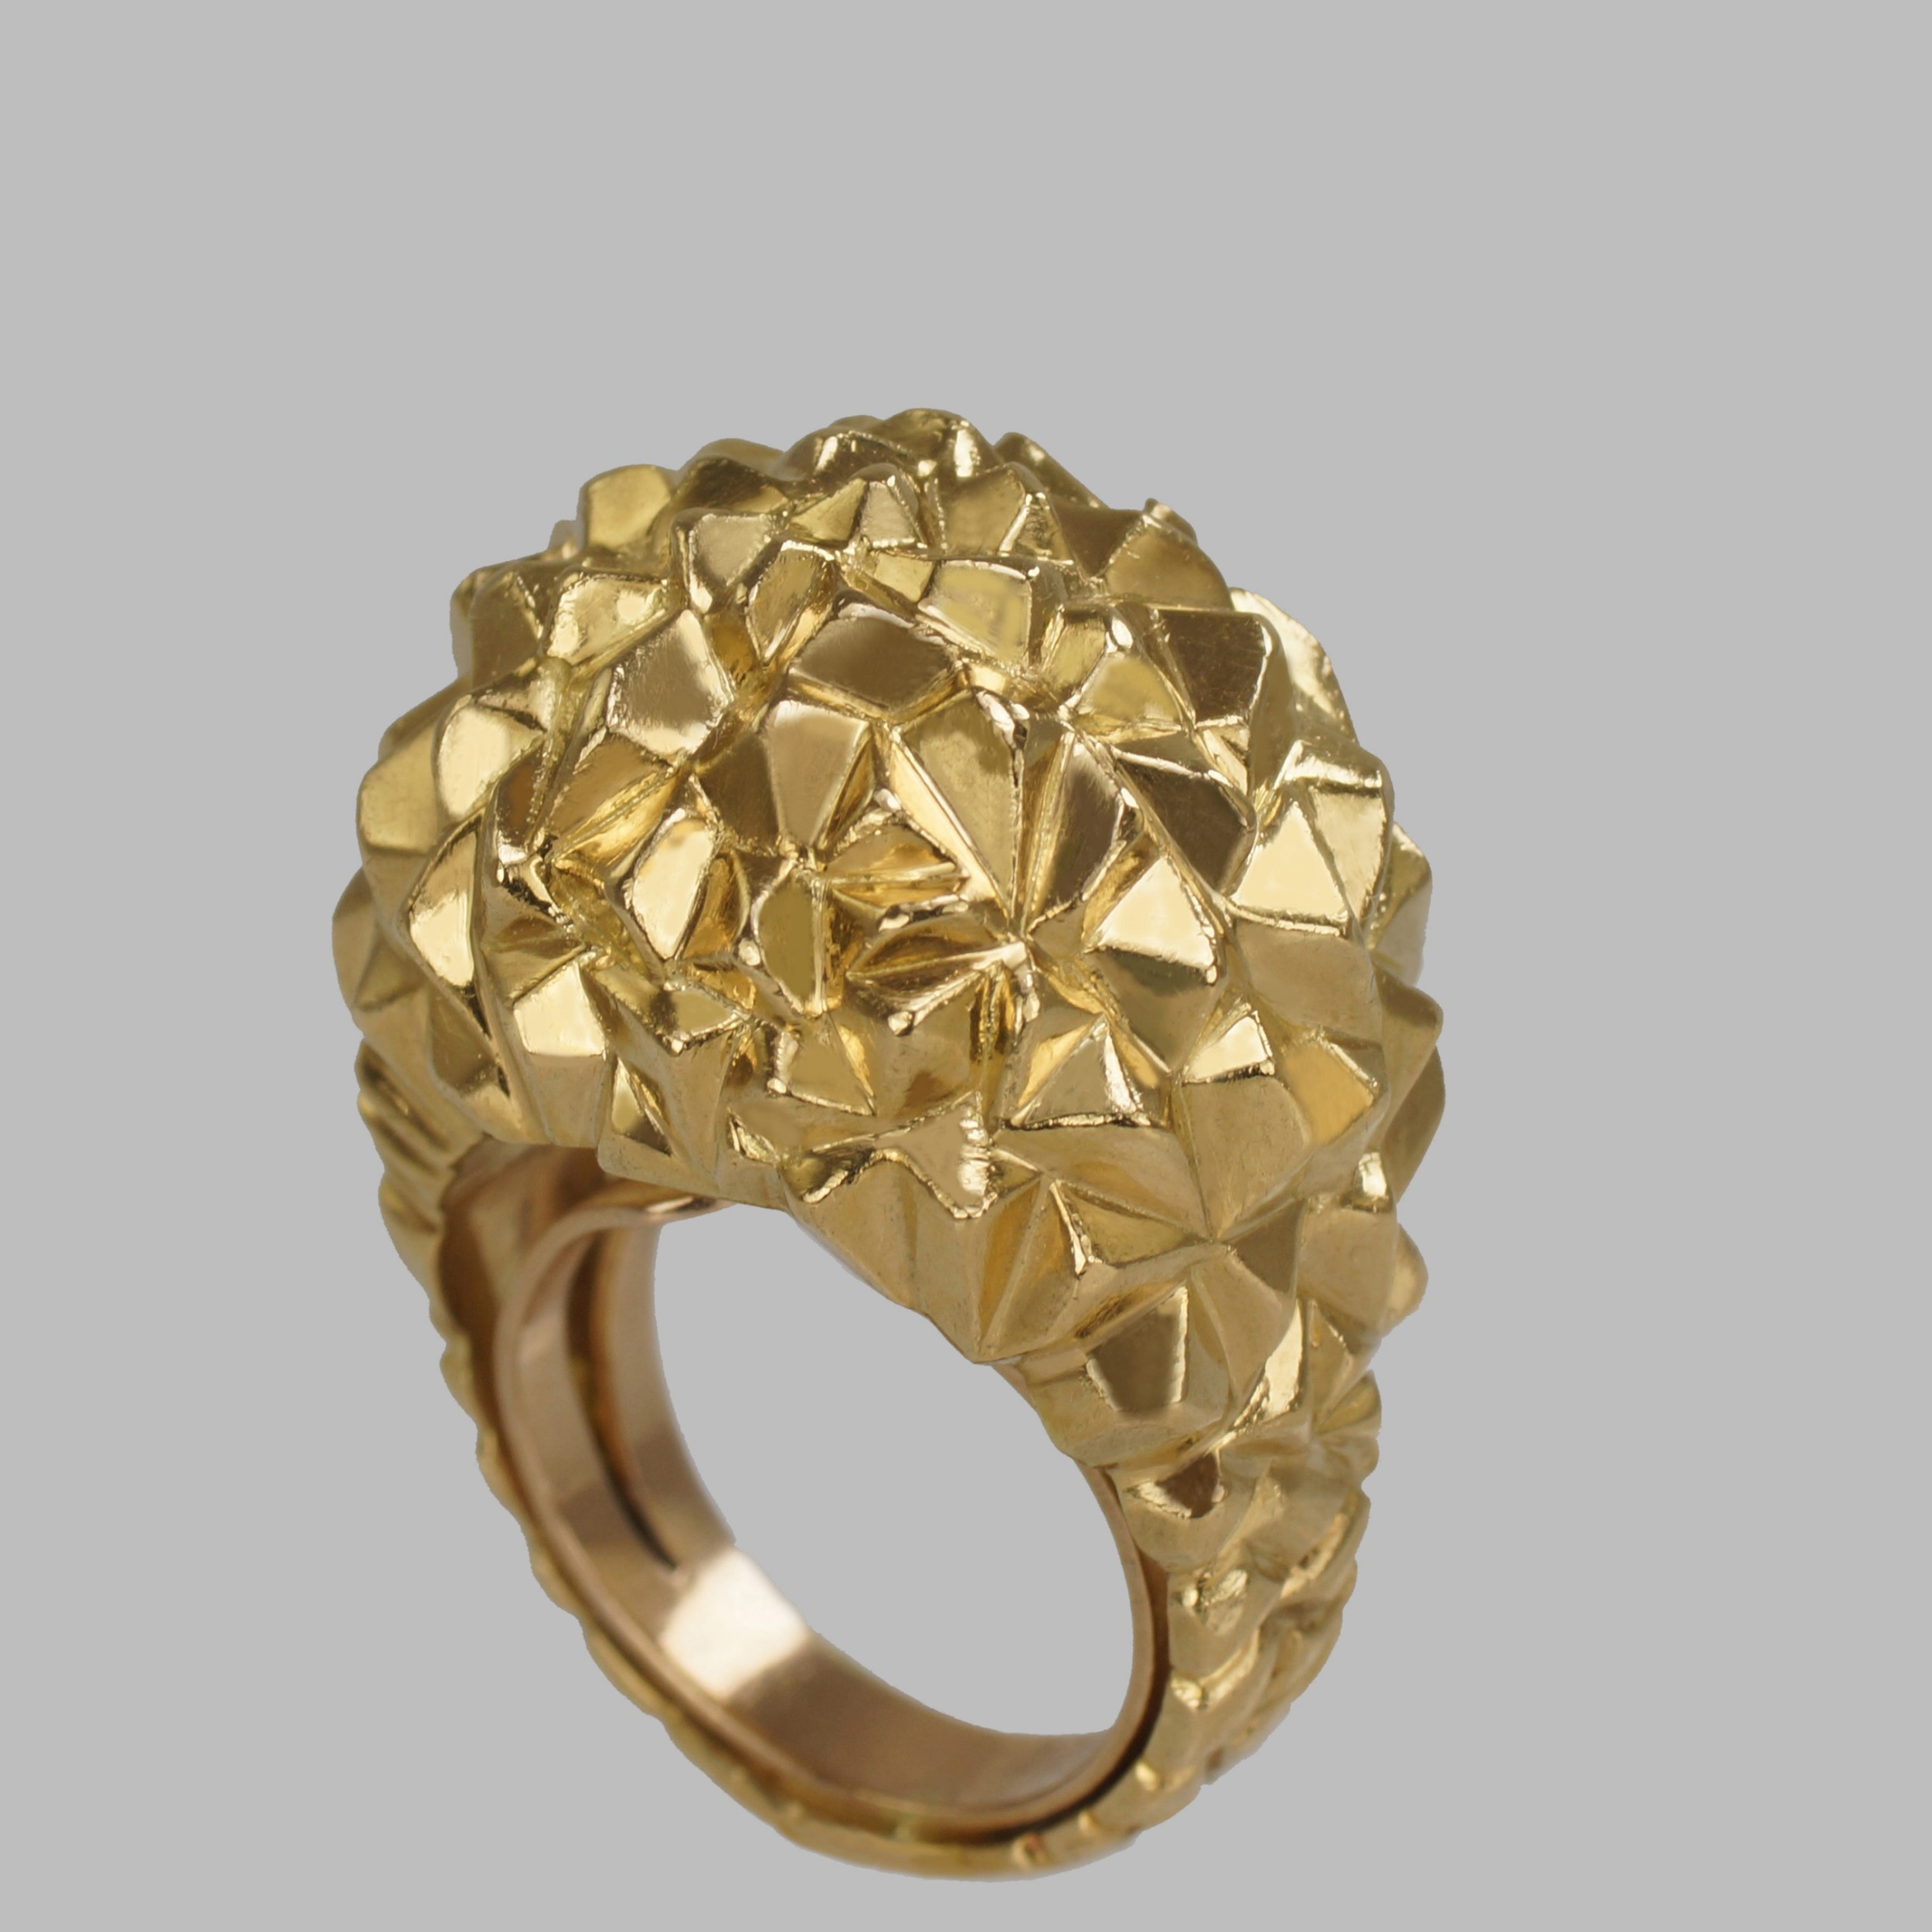 vintage kutchinsky bomb ring 18ct gold dress ring hallmarked london 1967 size i to size s